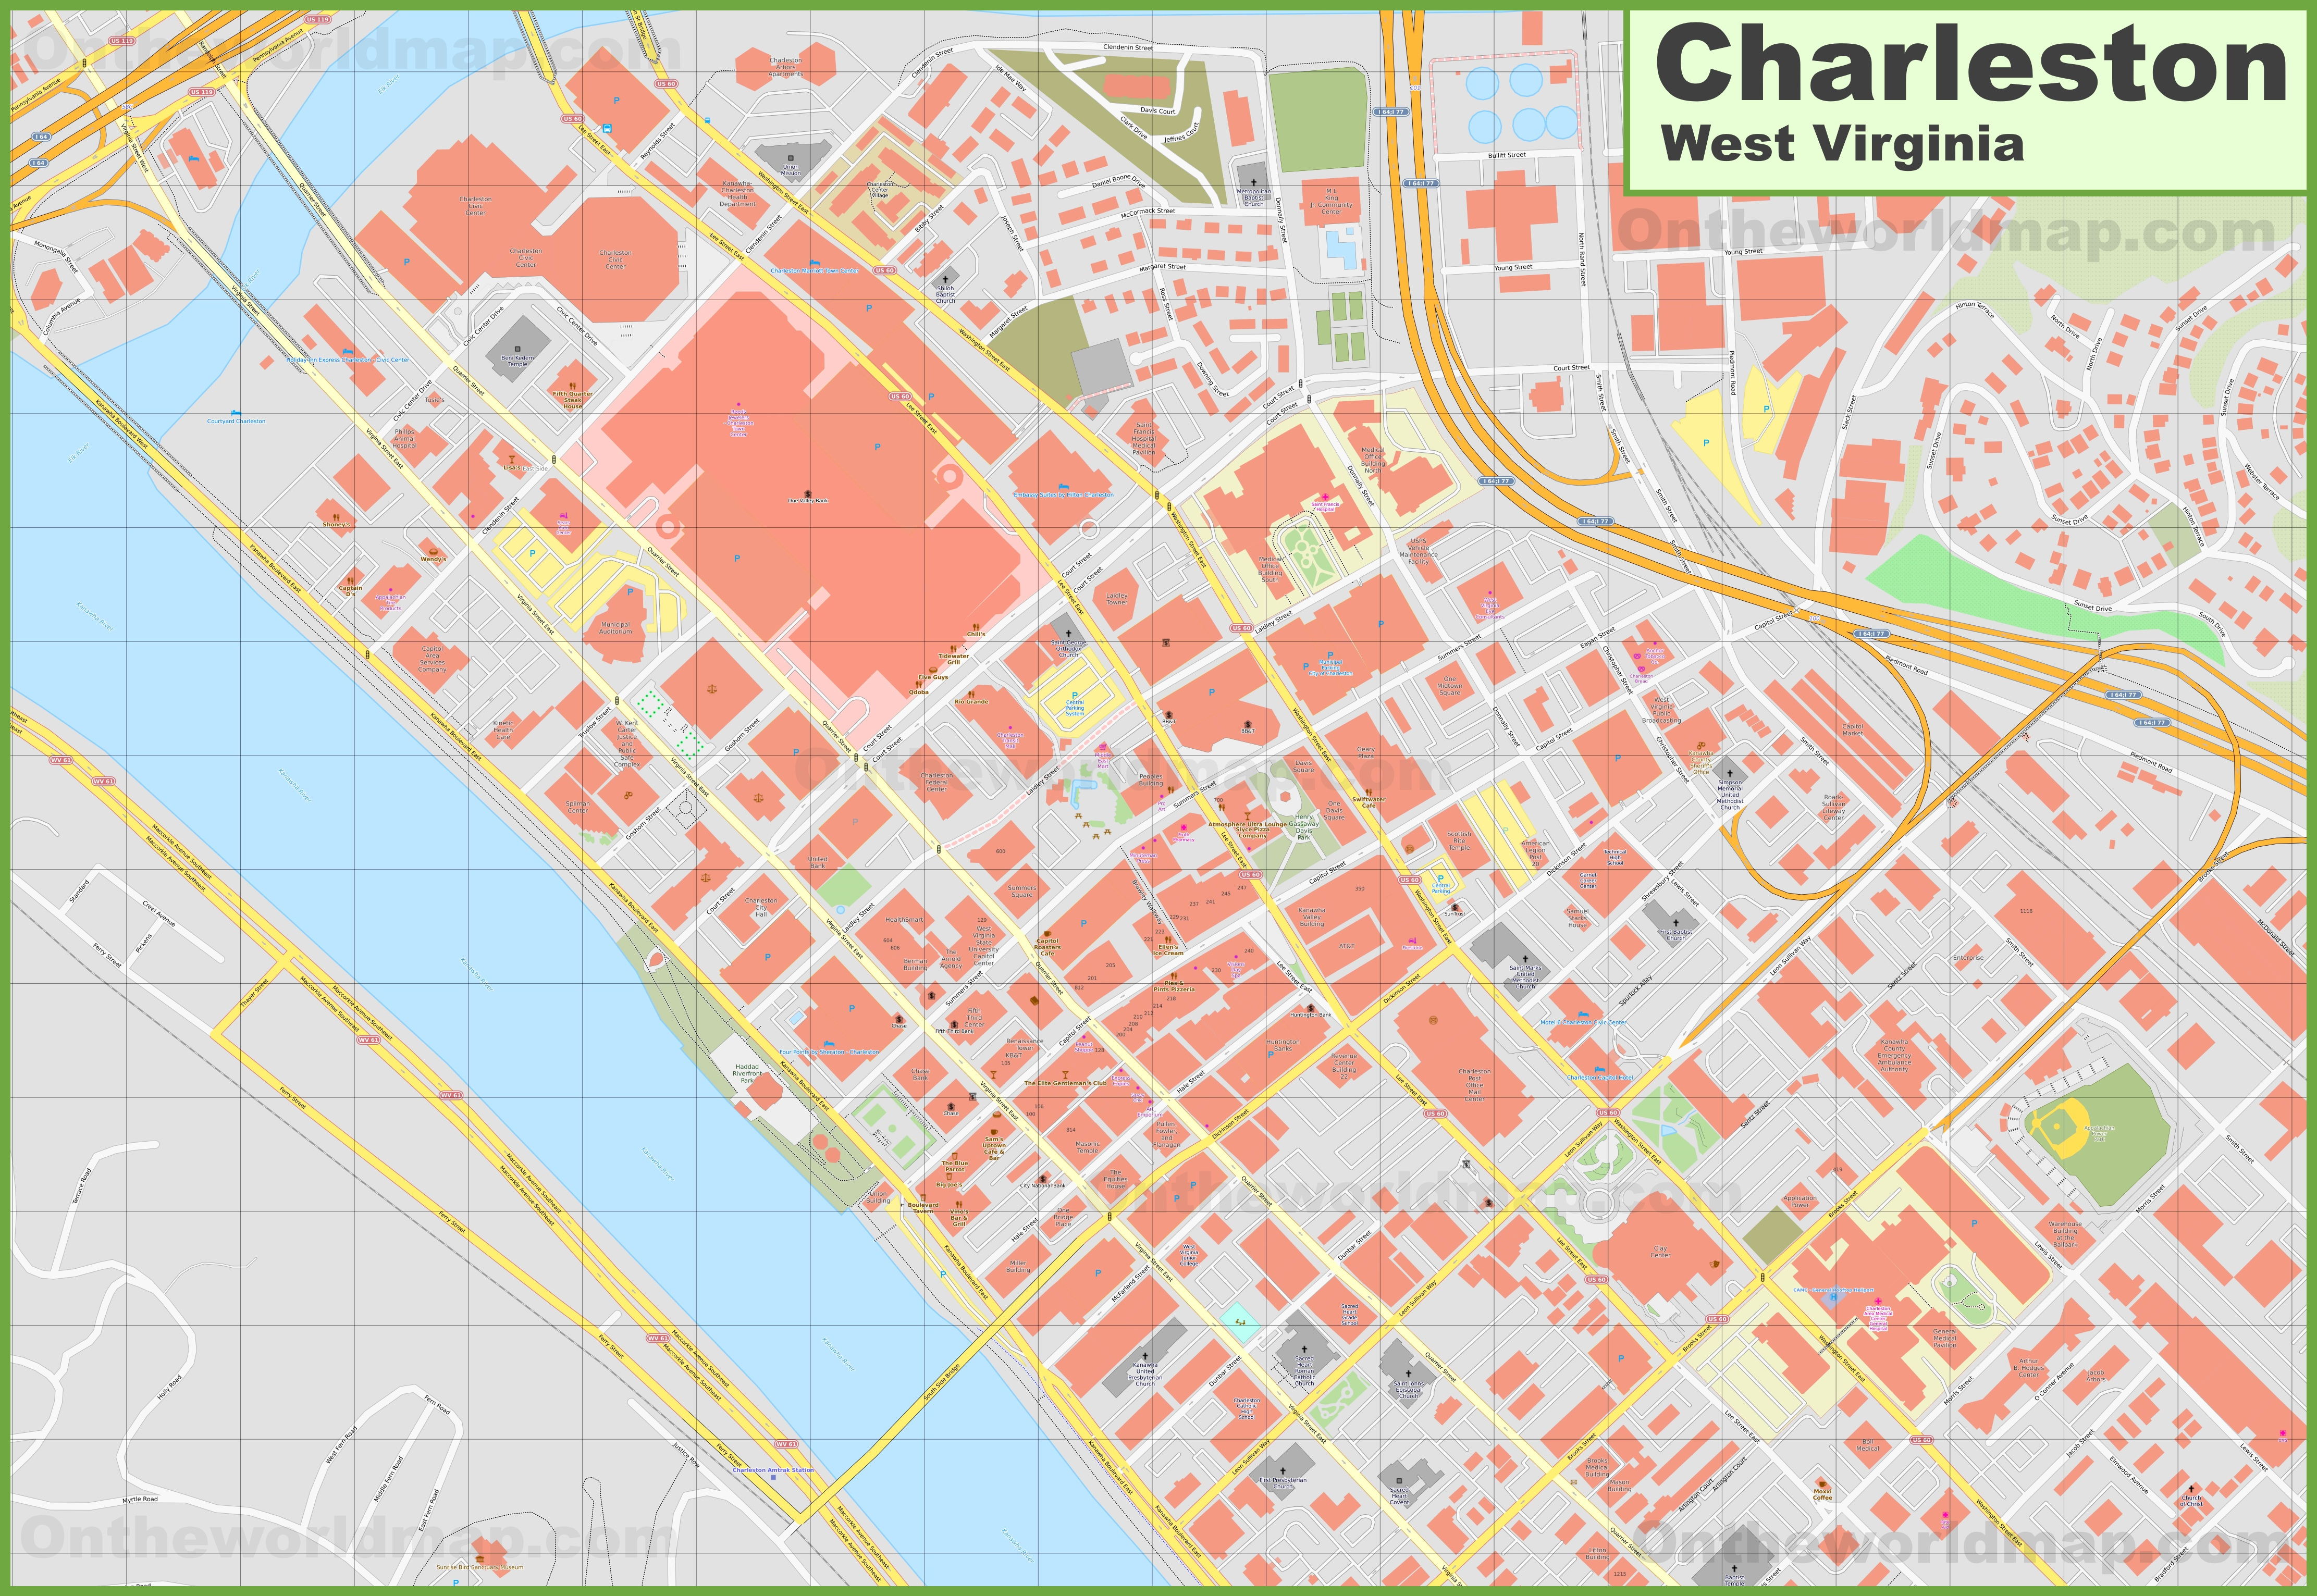 Charleston downtown map